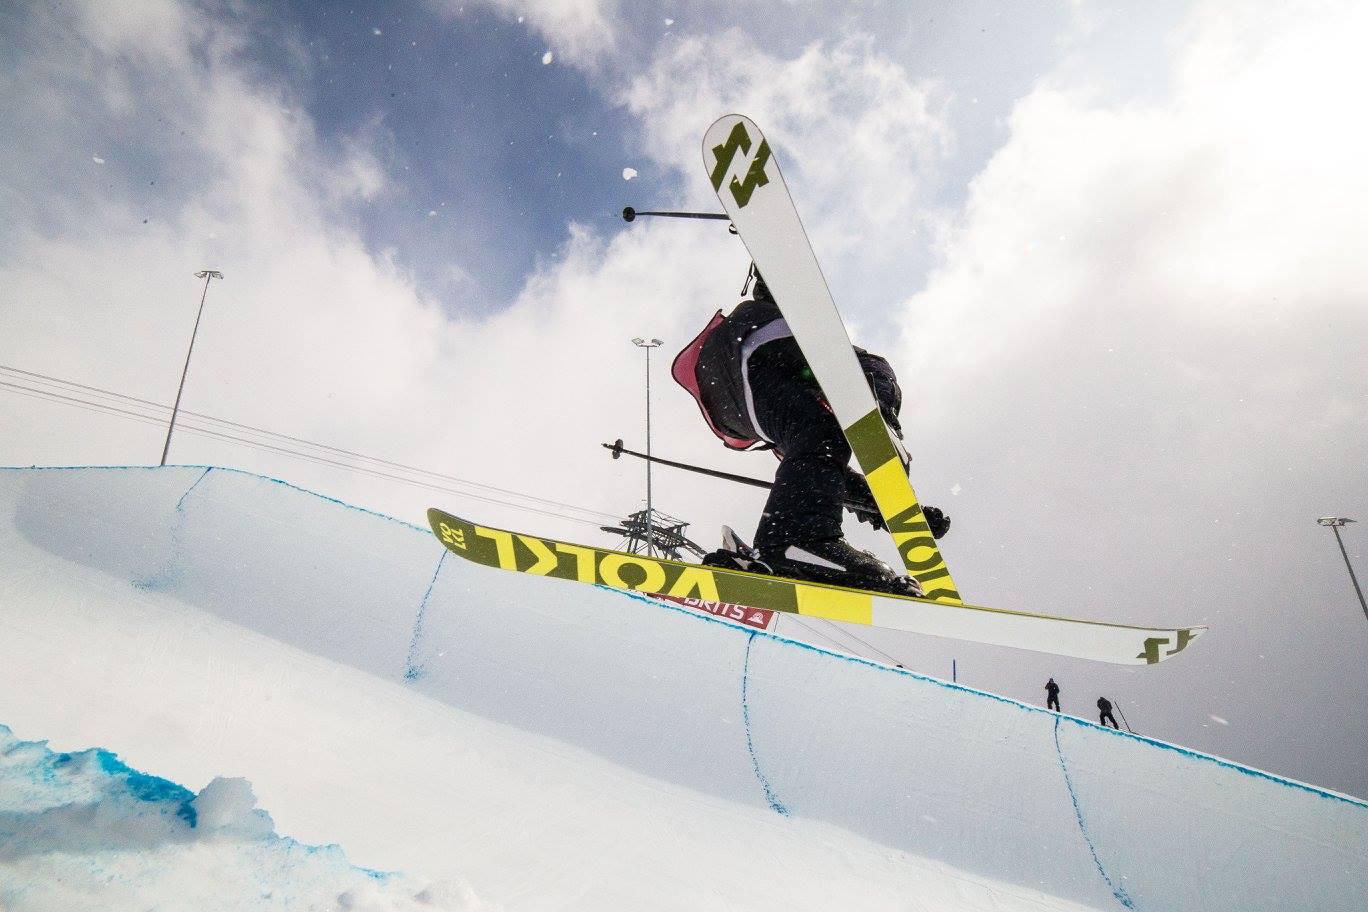 bradley fry laax 2017 brits championships